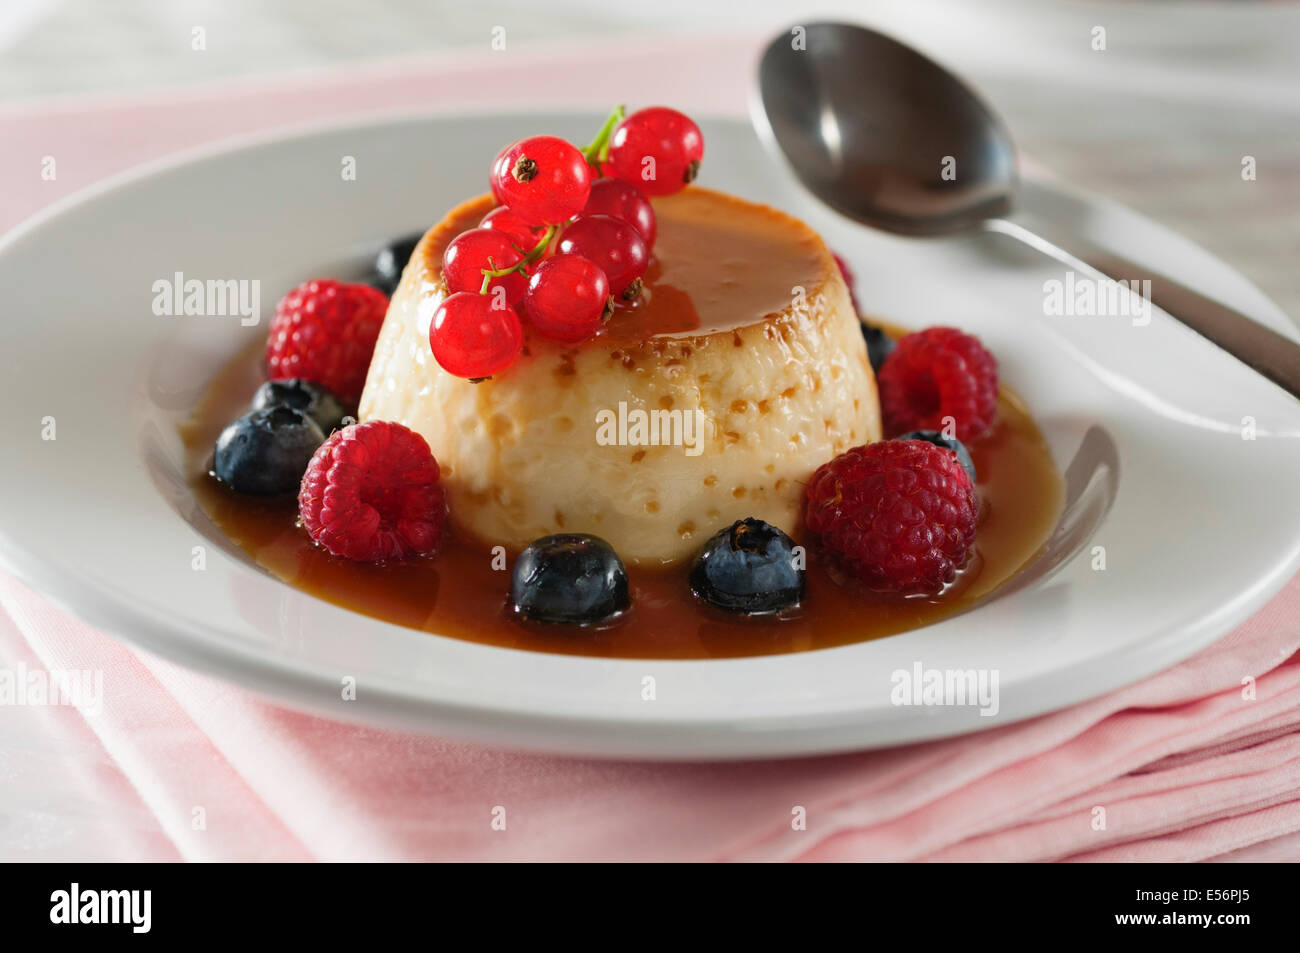 Crème caramel. Caramel custard dessert - Stock Image